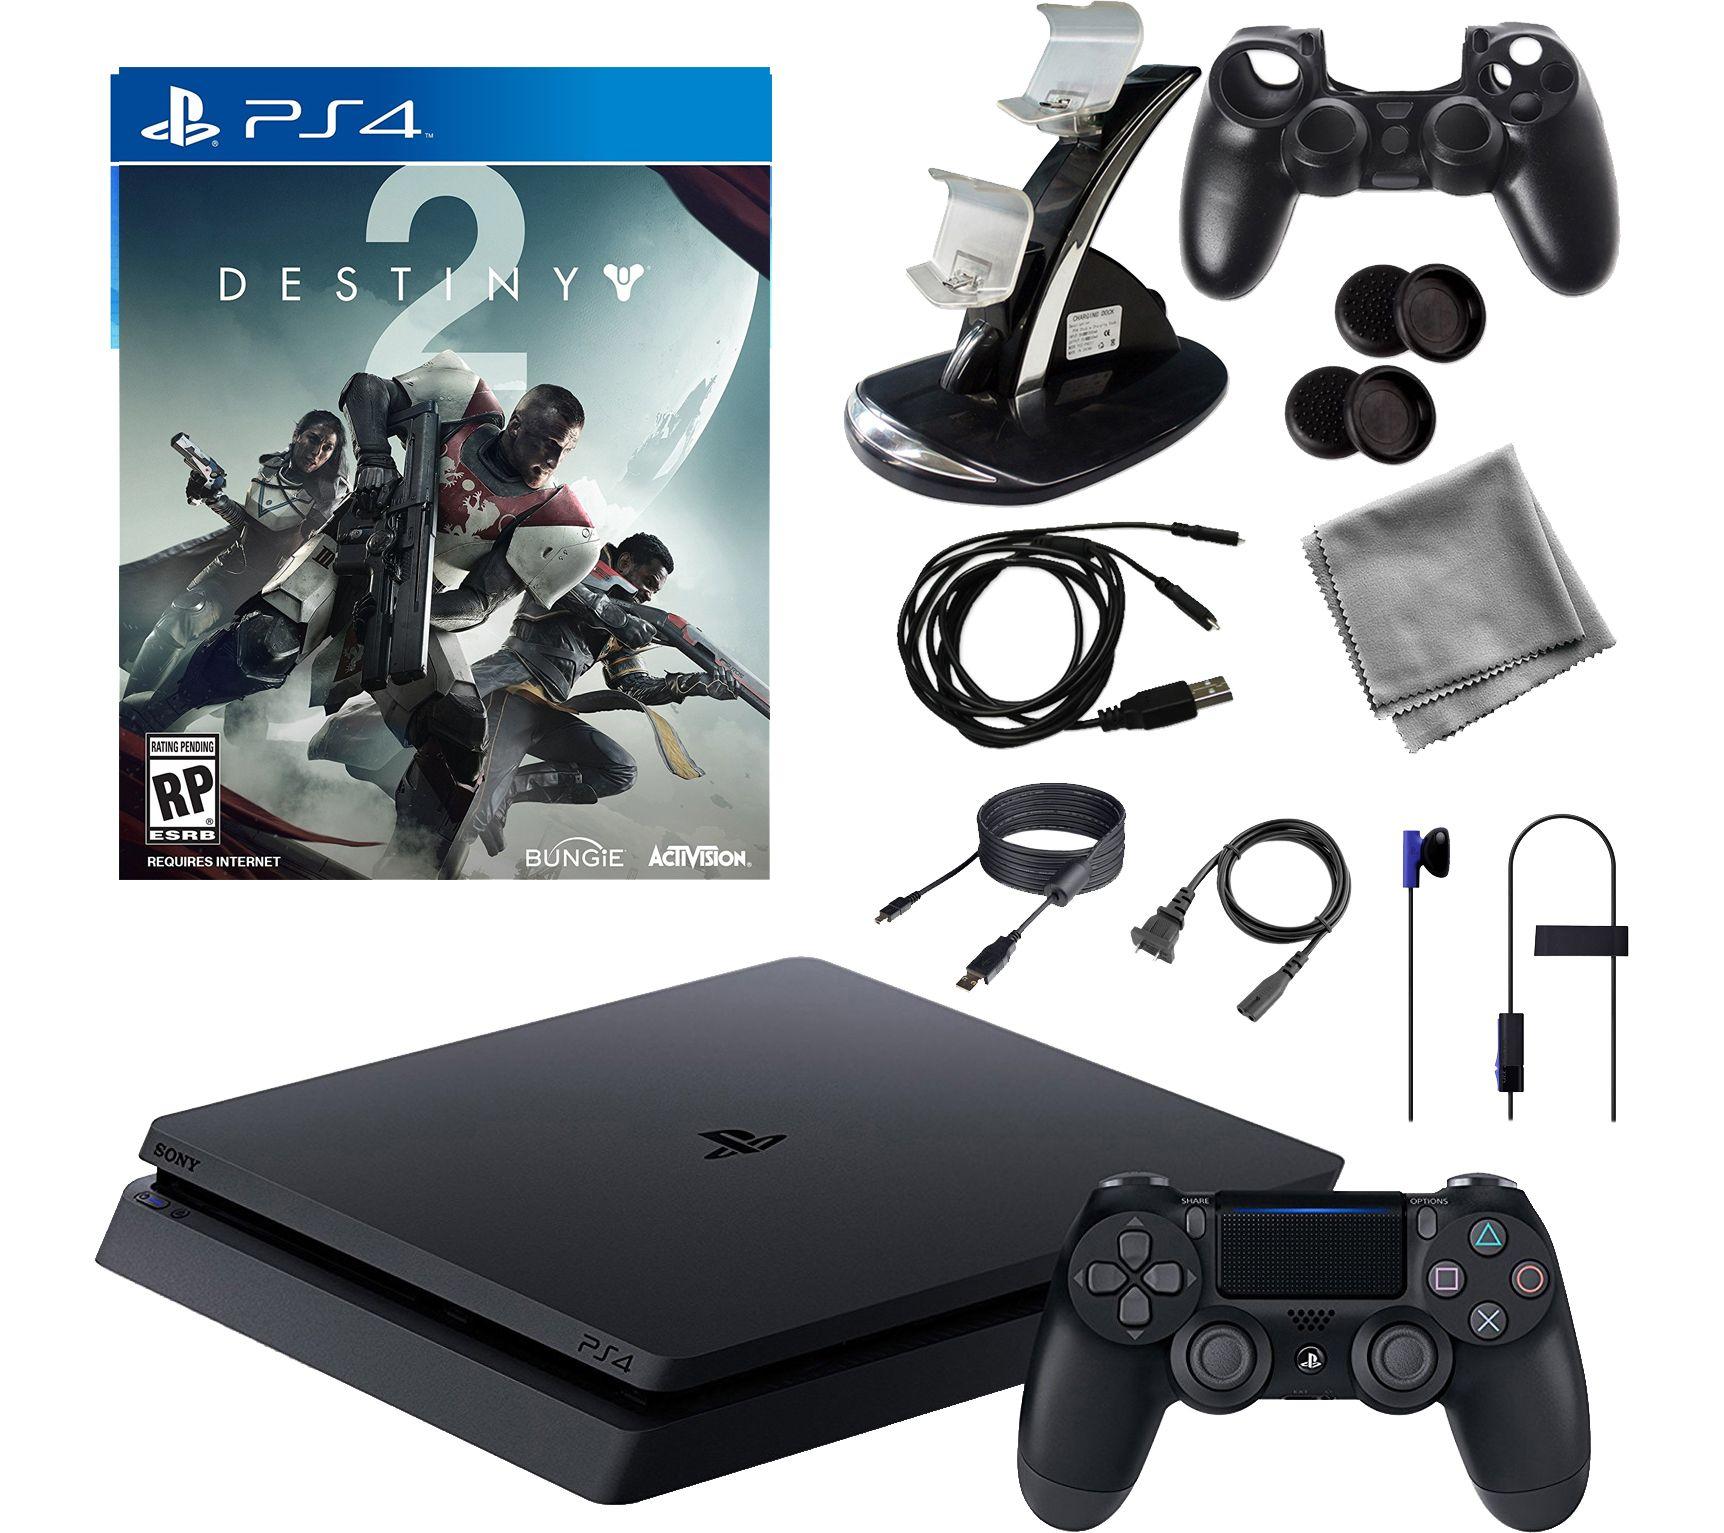 PS4 1TB Core Console with Destiny 2 and Accessories — QVC com